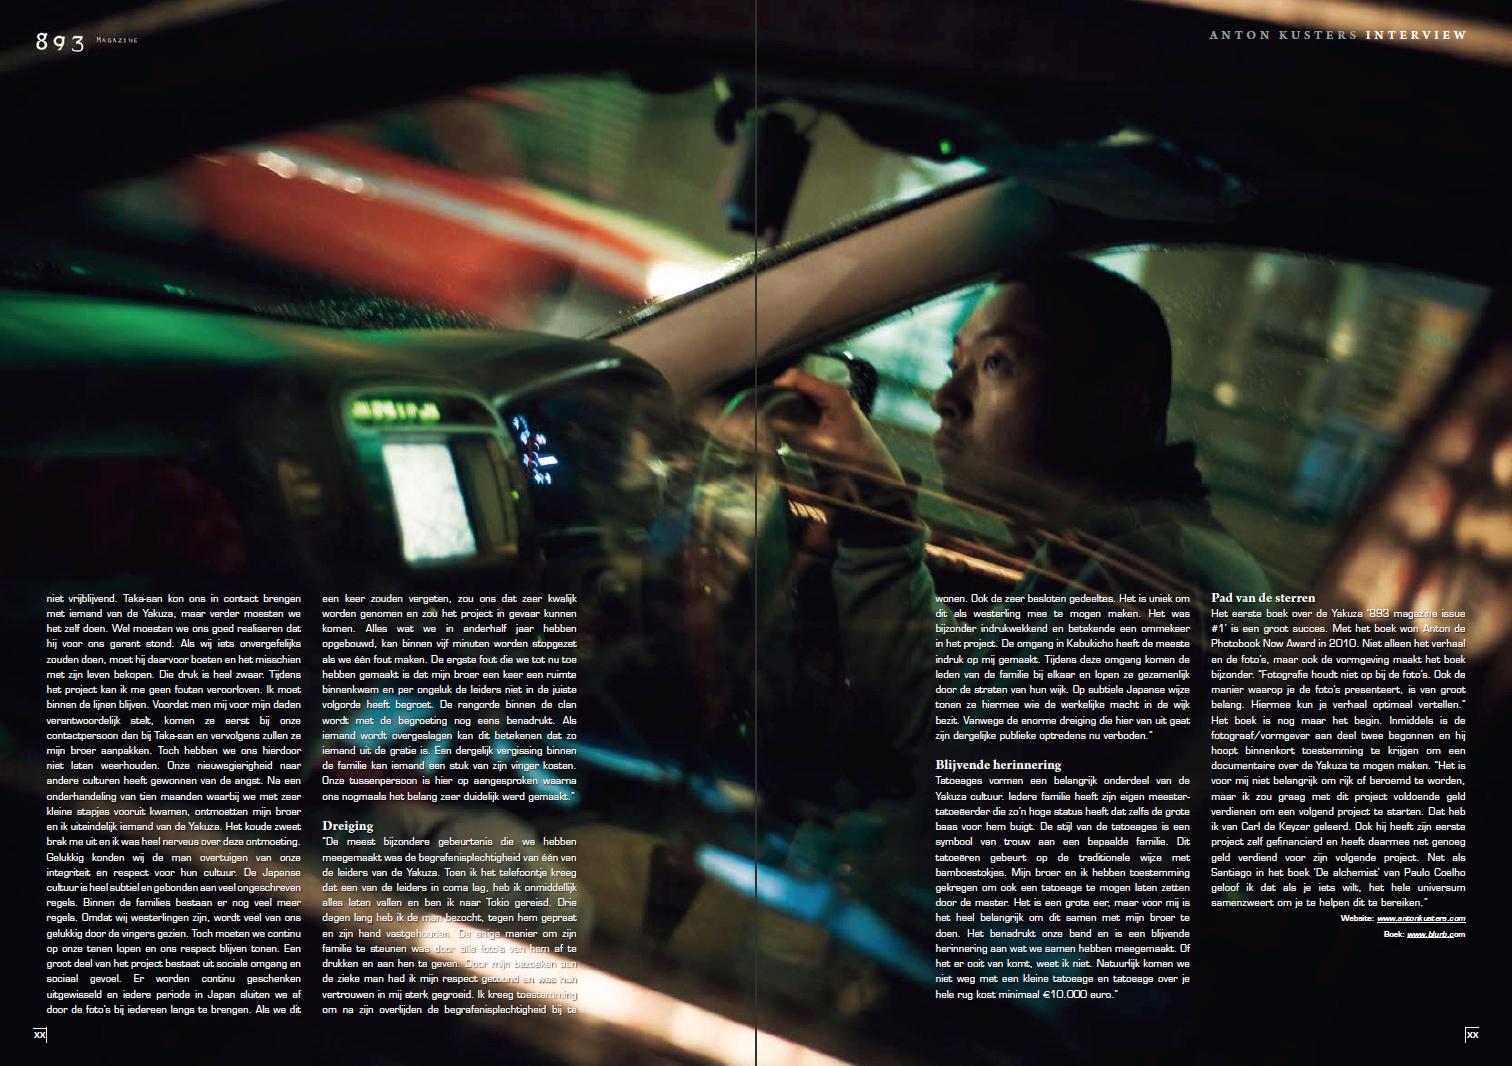 interview_fotografie_01-11_p9-10.jpg